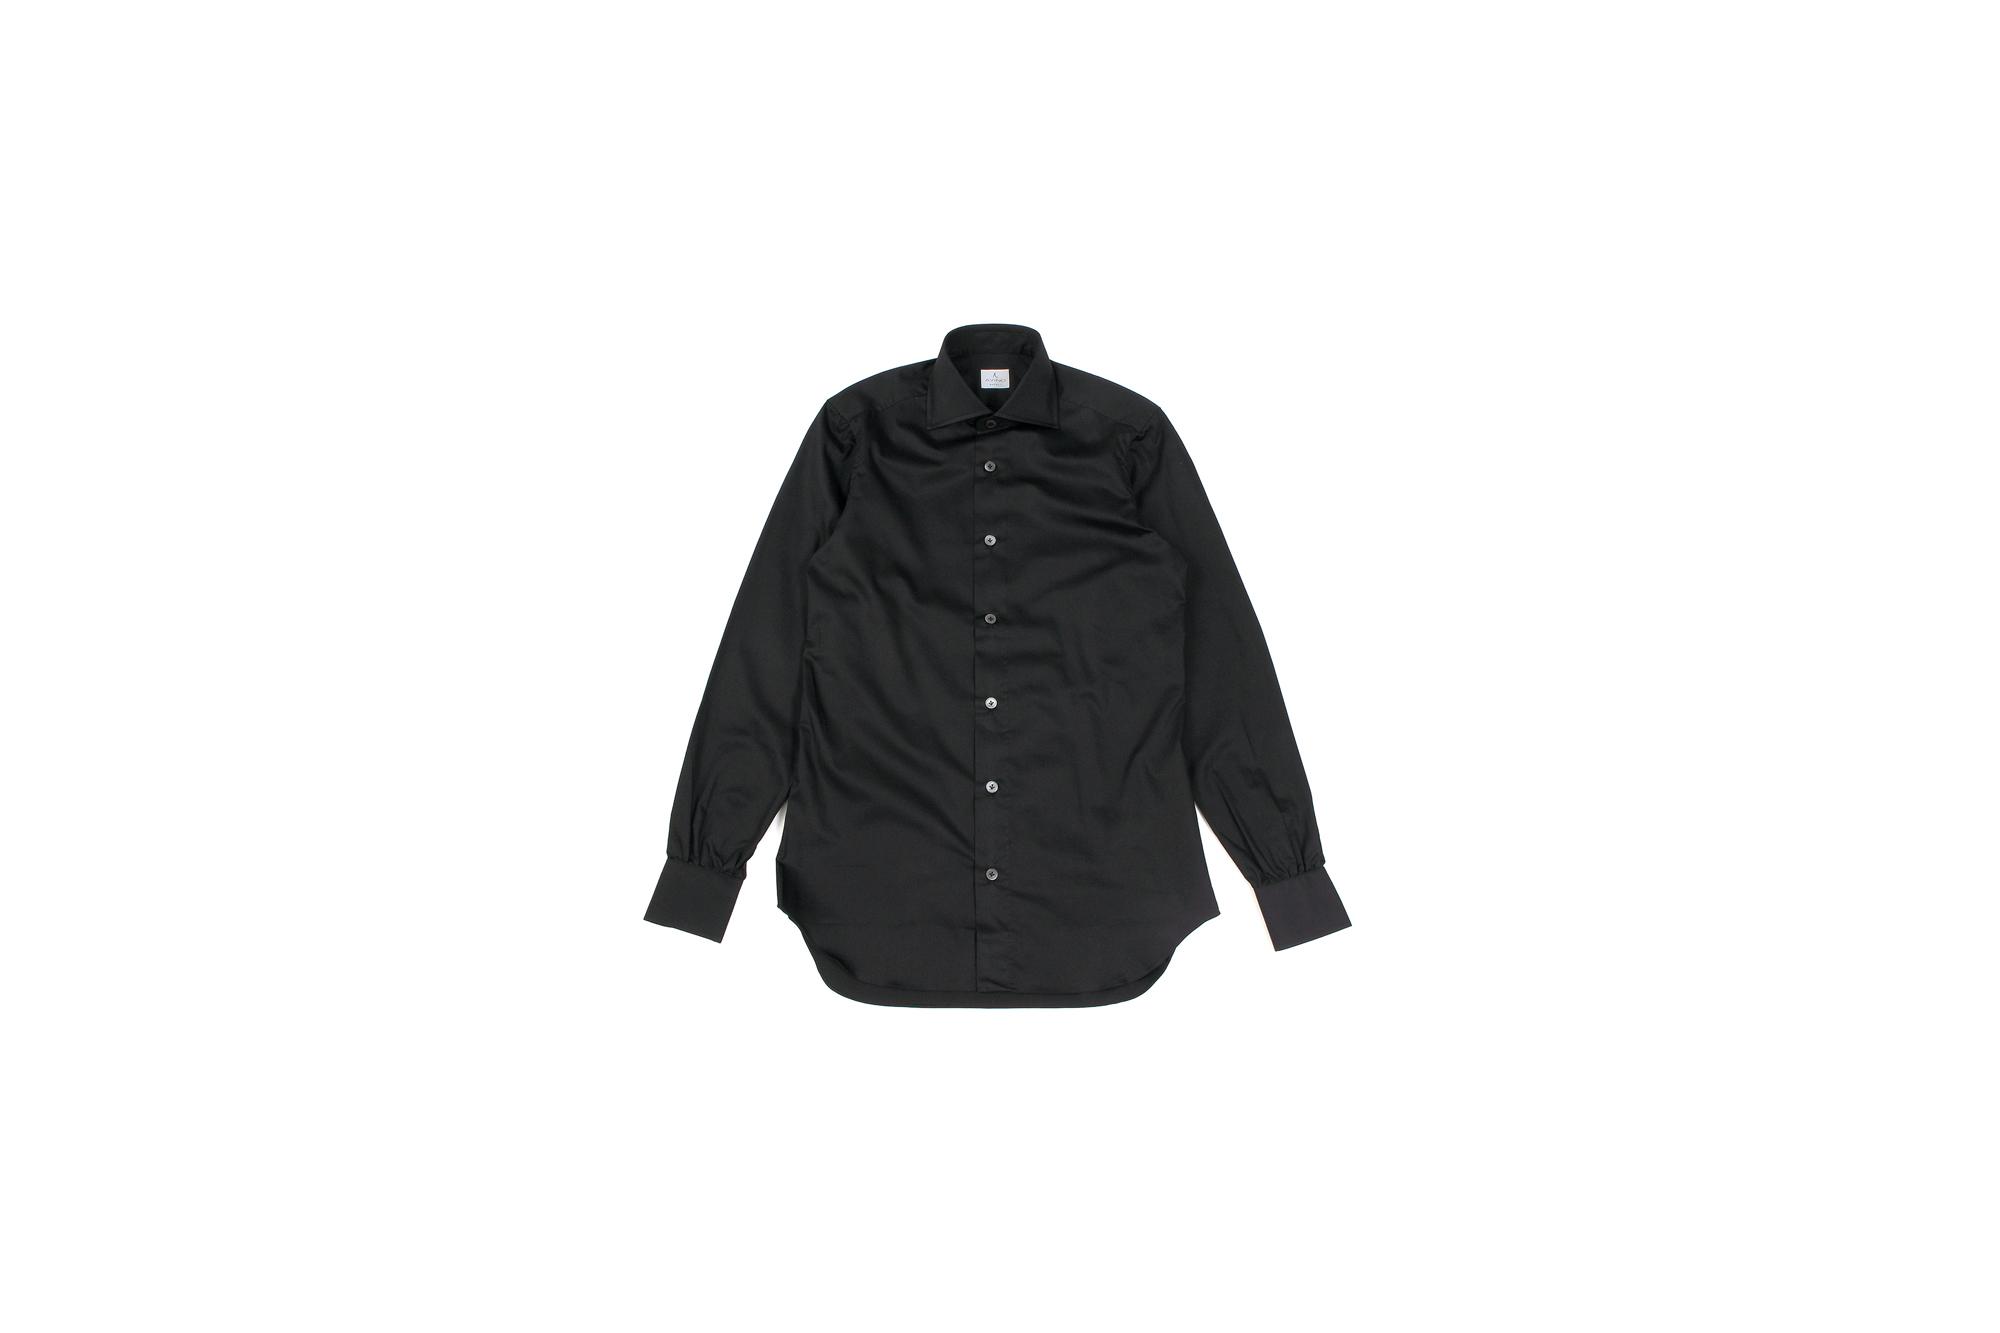 AVINO(アヴィーノ) Poplin Dress Shirts コットン ブロード ポプリン ドレスシャツ BLACK(ブラック) made in italy (イタリア製) 2019 秋冬新作 愛知 名古屋 altoediritto アルトエデリット